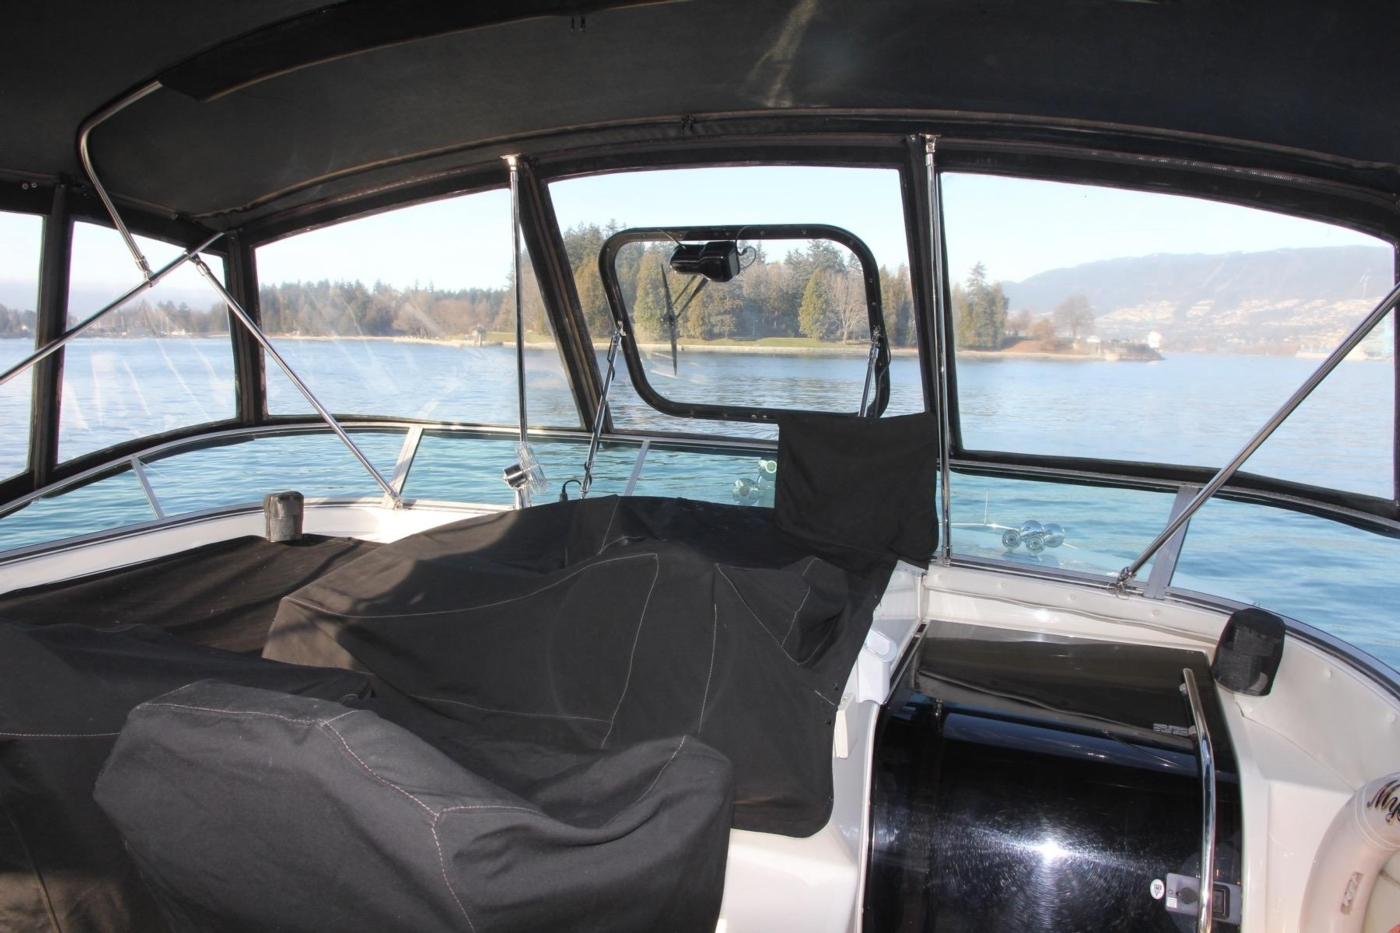 1999 Bayliner 5788 Pilot House Motoryacht, Canvas Covers Helm Station